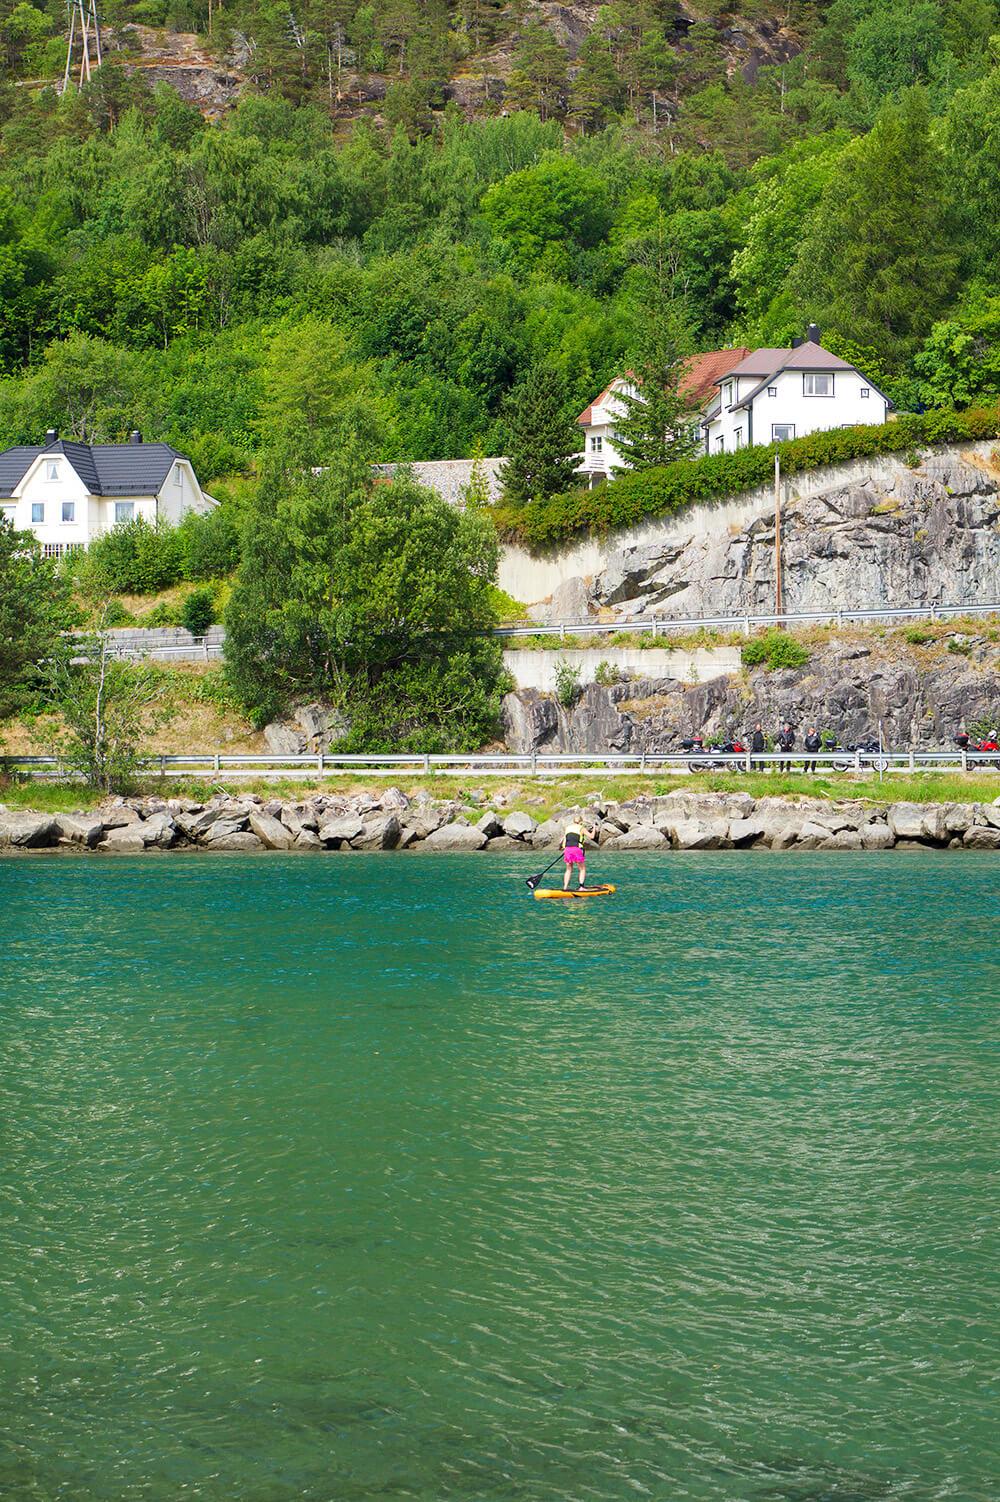 Stand Up Paddling - SUP i Norge - mina bästa tips